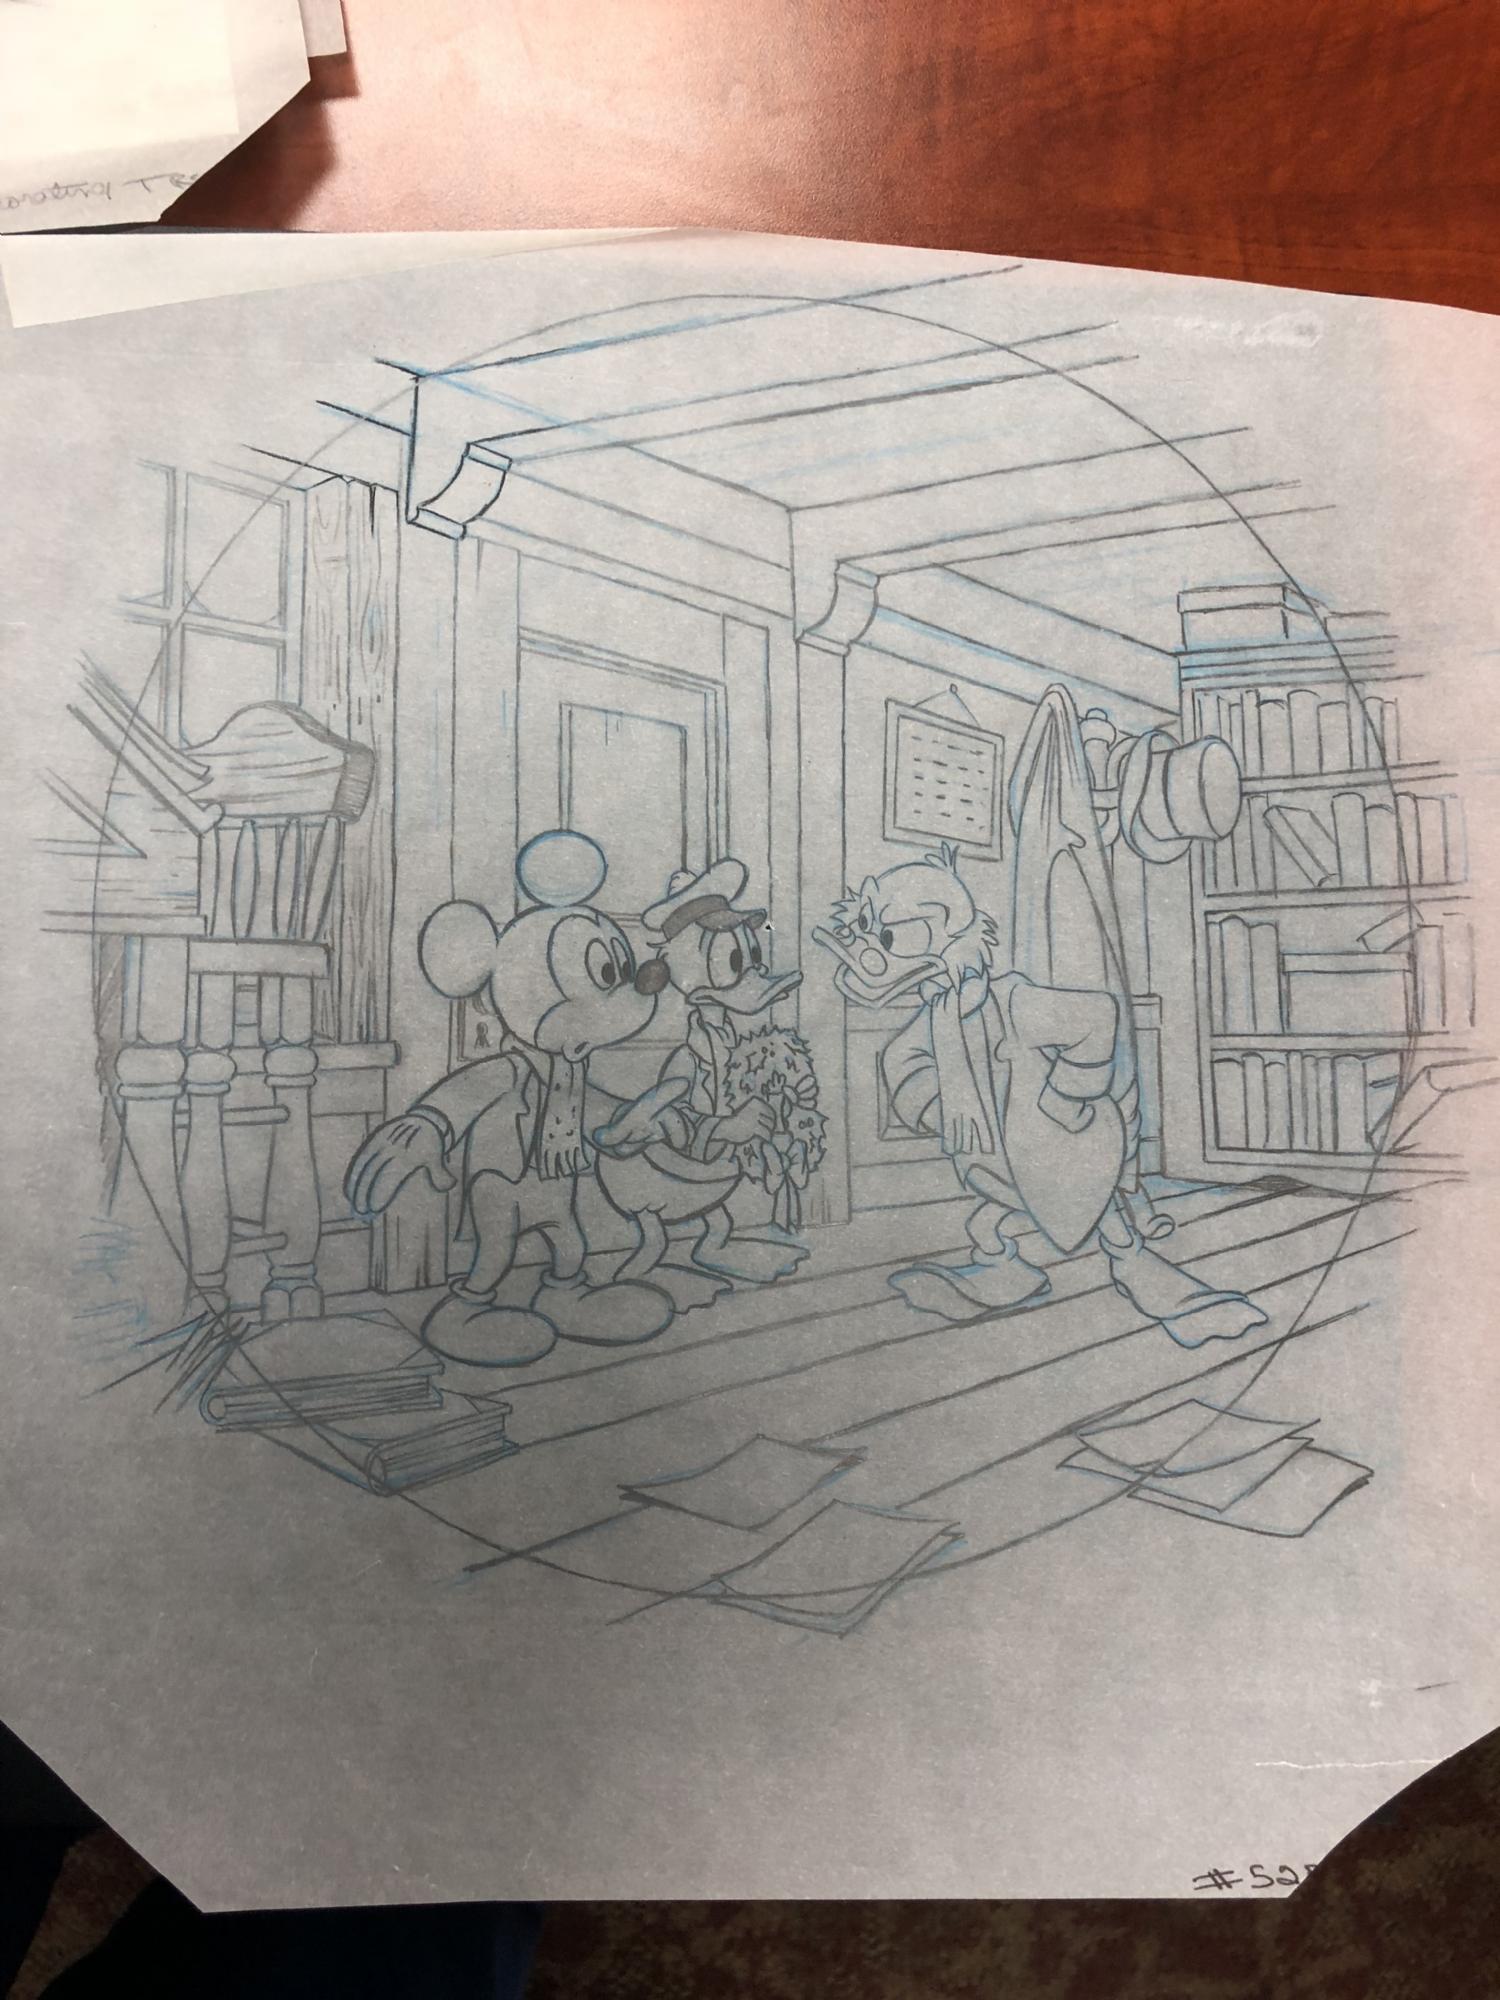 Mickey S Christmas Carol Collector S Plate Design Art Walt Disney C 1990s In Roland Benton S Disney Mickey S Christmas Carol Hand Painted Cels Plate Art Comic Art Gallery Room